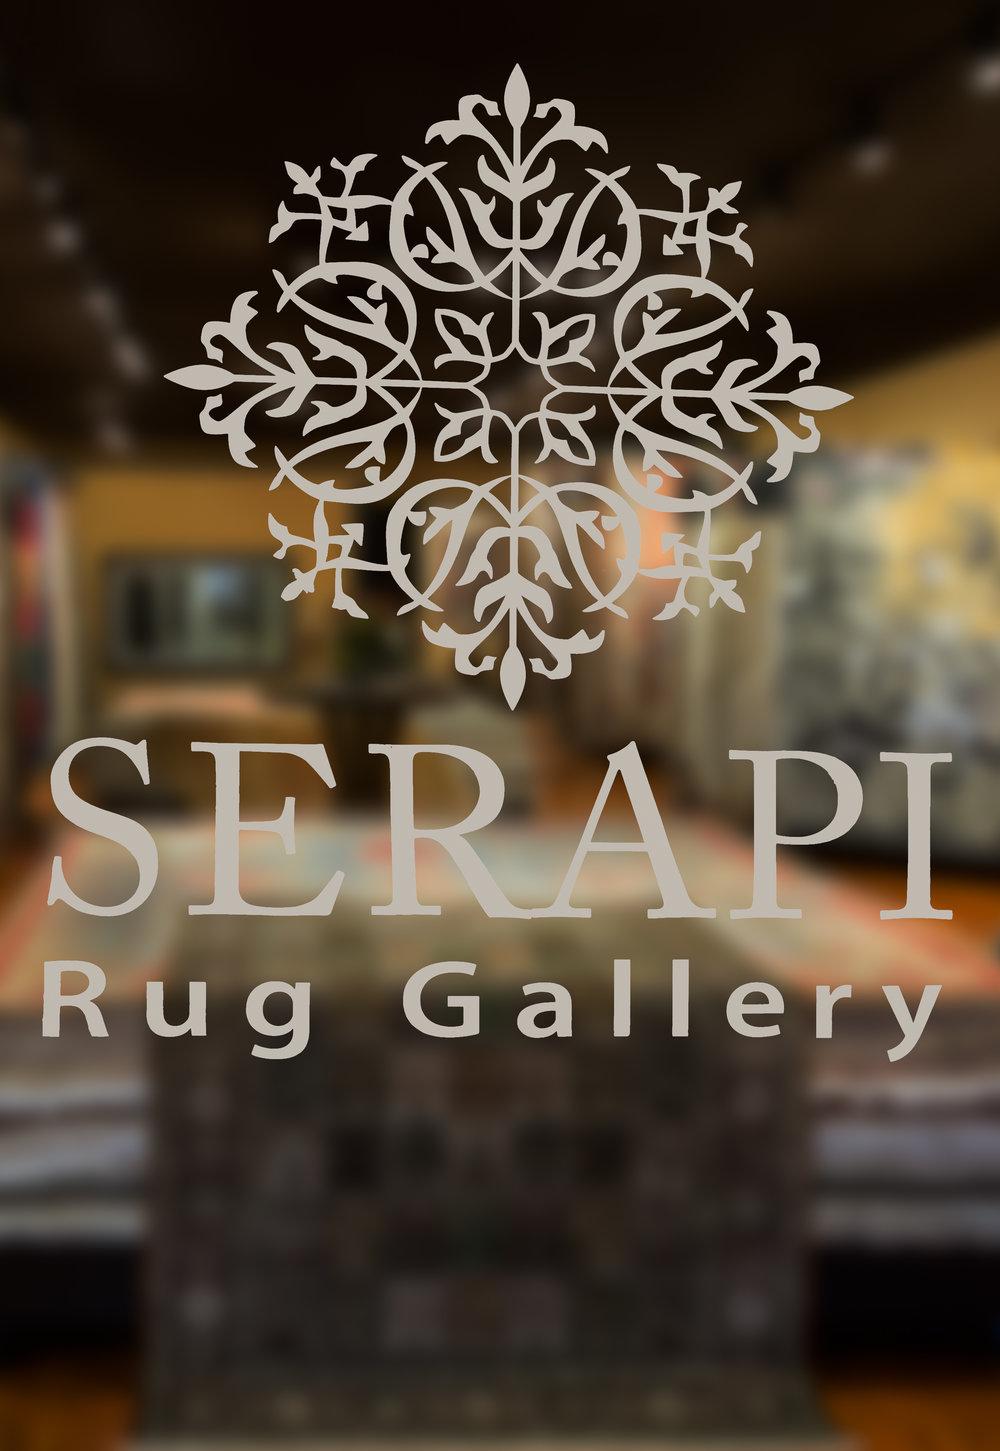 Copy of Serapi-7.jpg